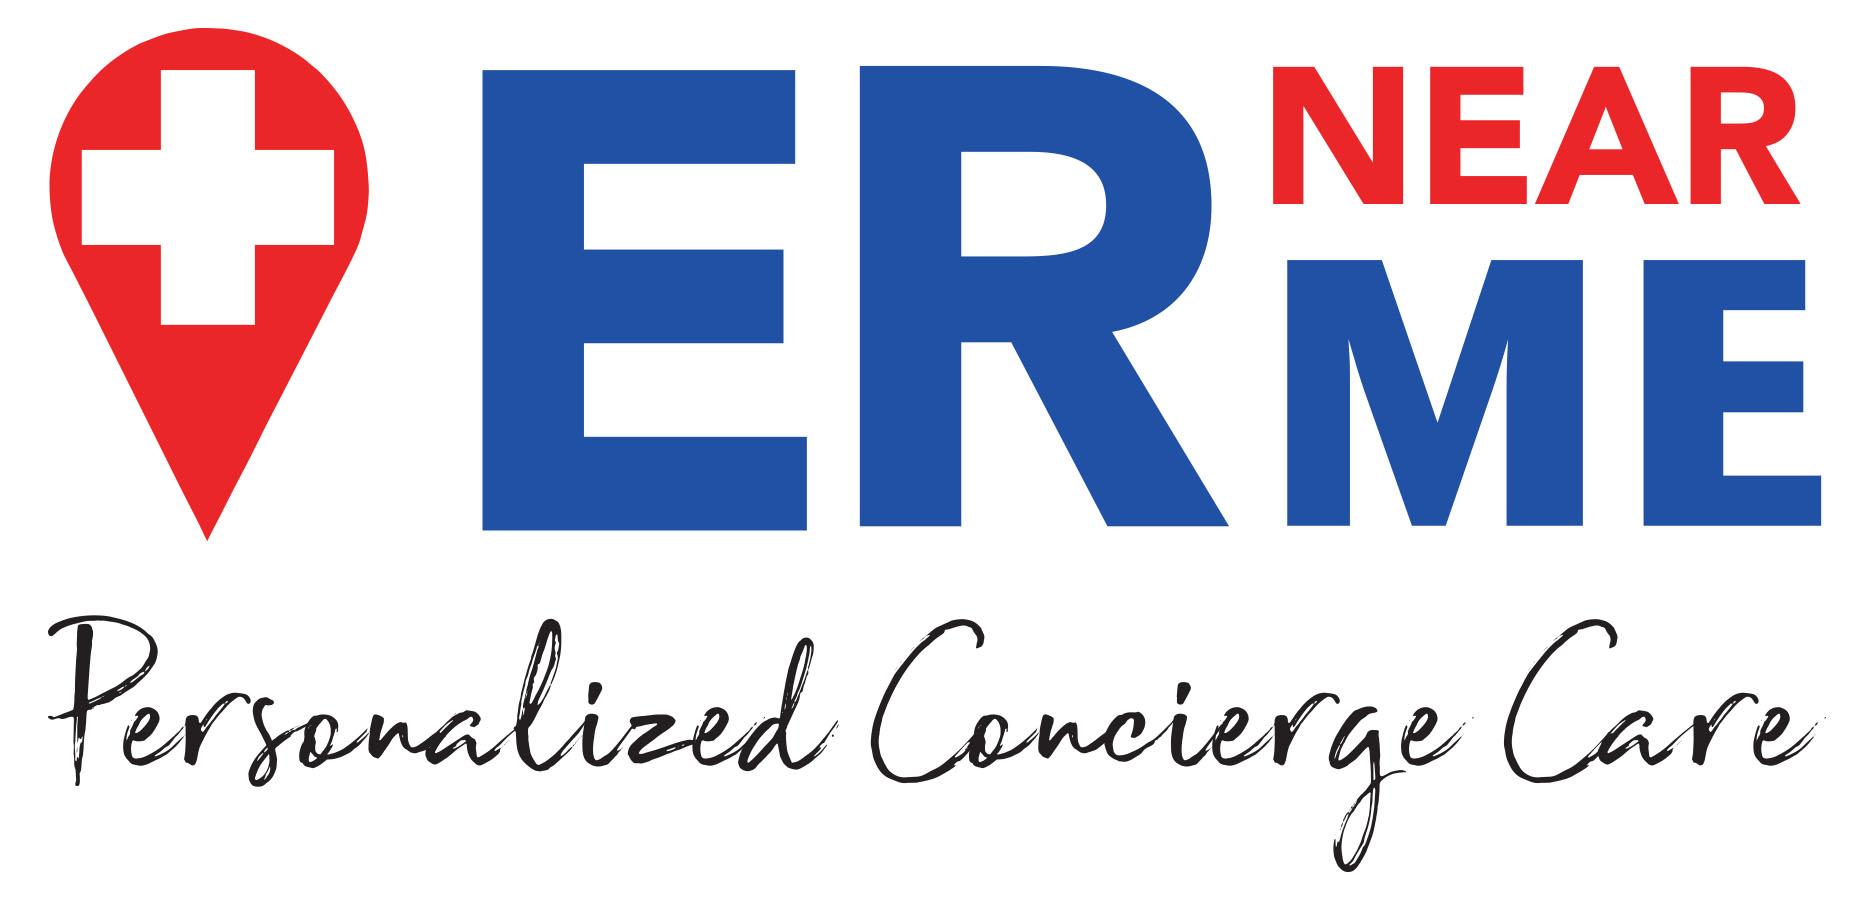 ERNM Congierge-logo